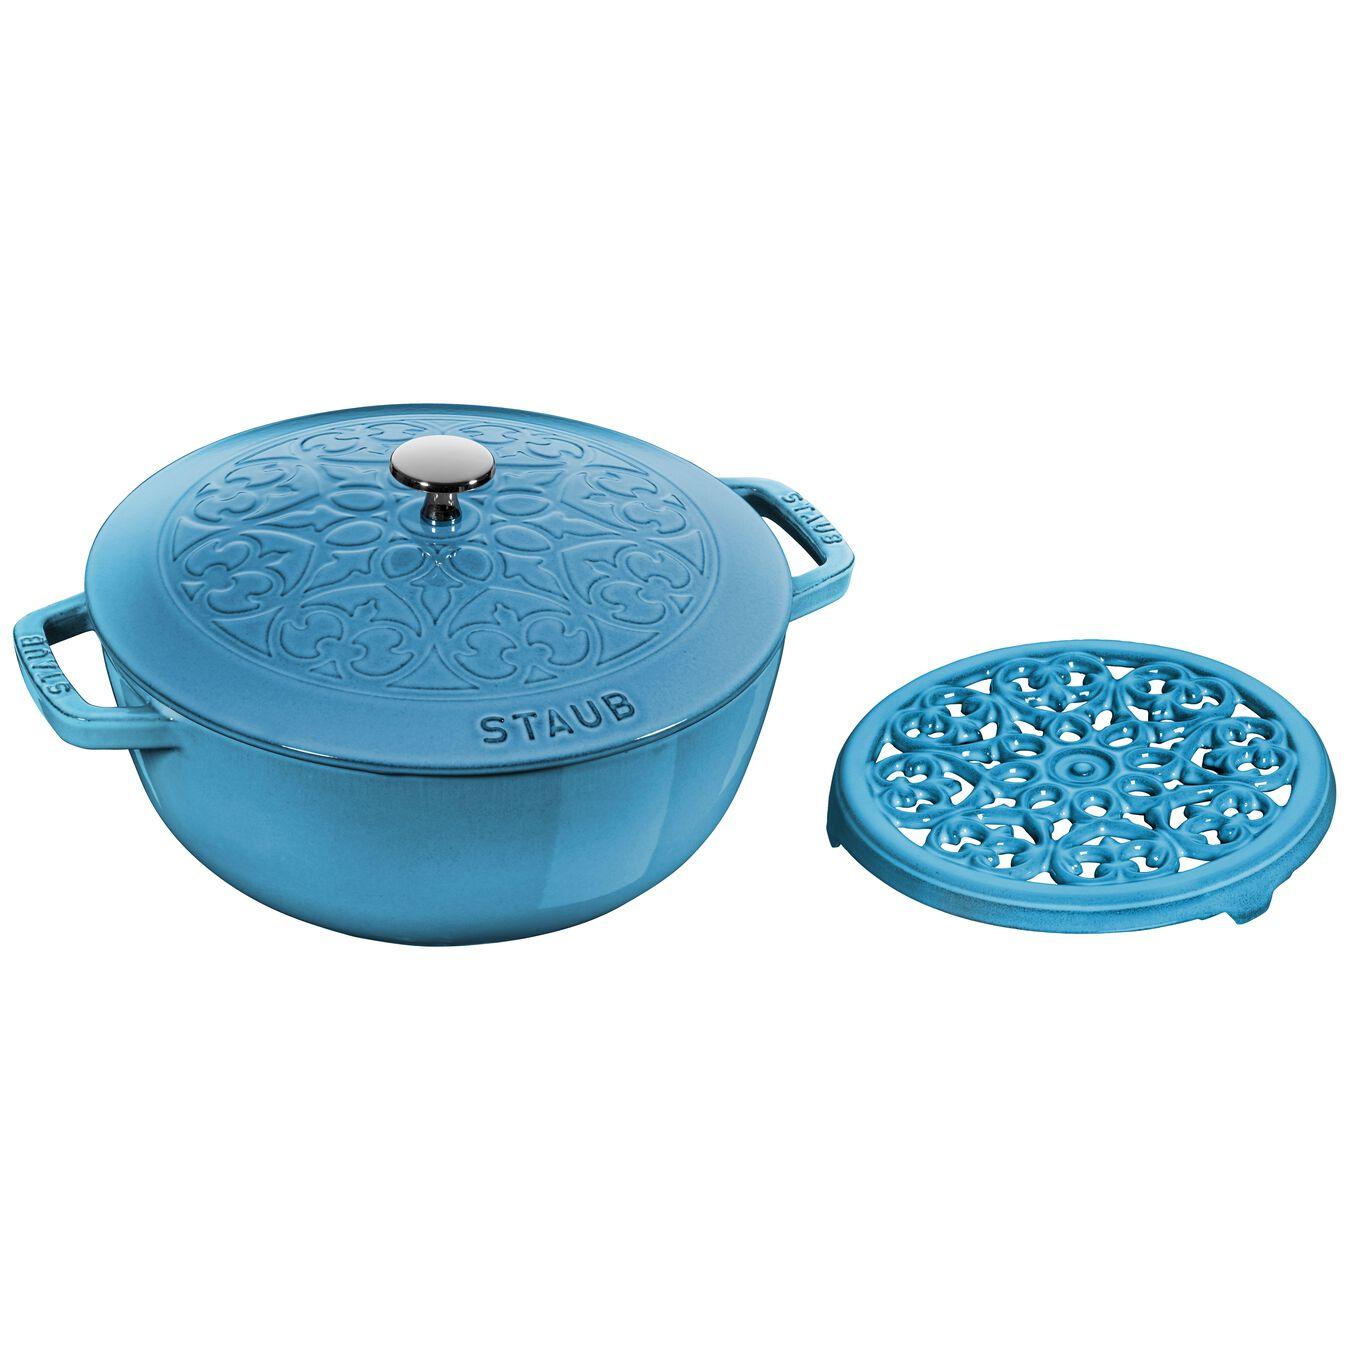 Pot set, lily decal, 2 Piece   round   cast iron   ice-blue,,large 1